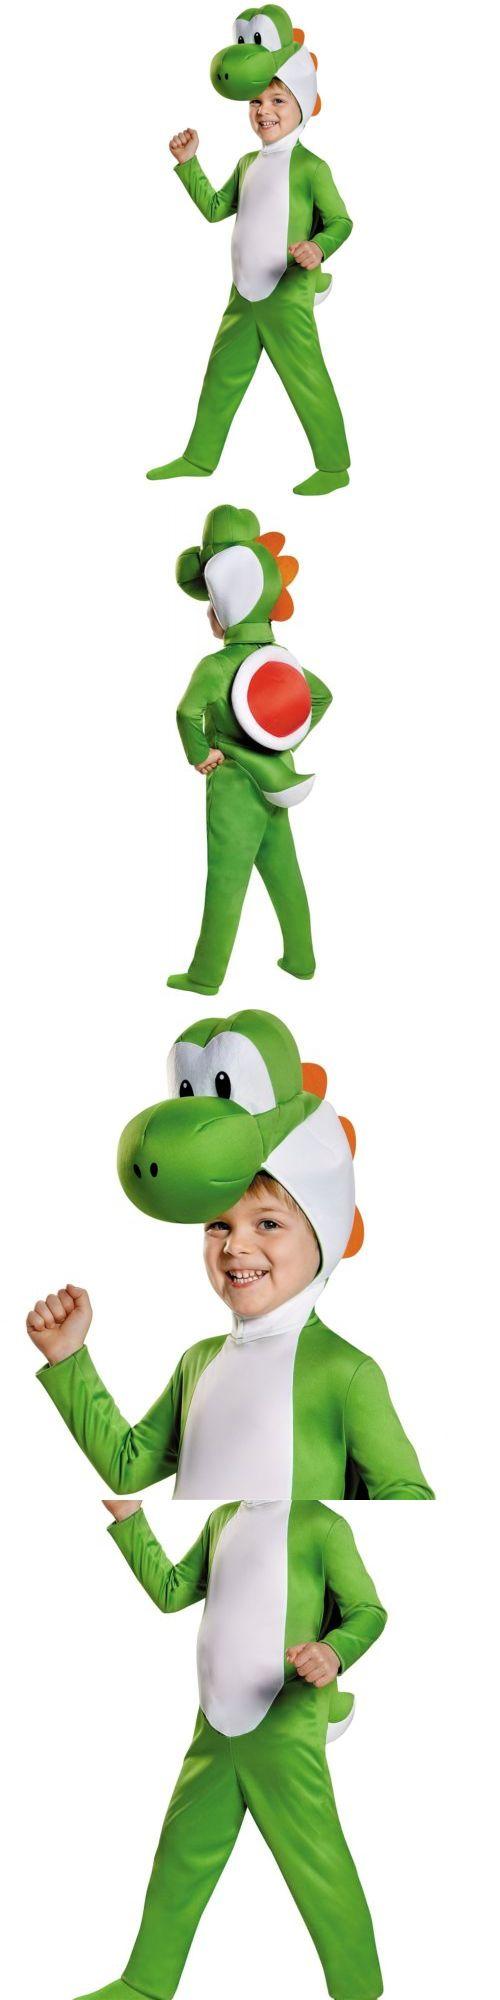 Best 25+ Yoshi costume ideas on Pinterest | Cosplay cam, Mario ...